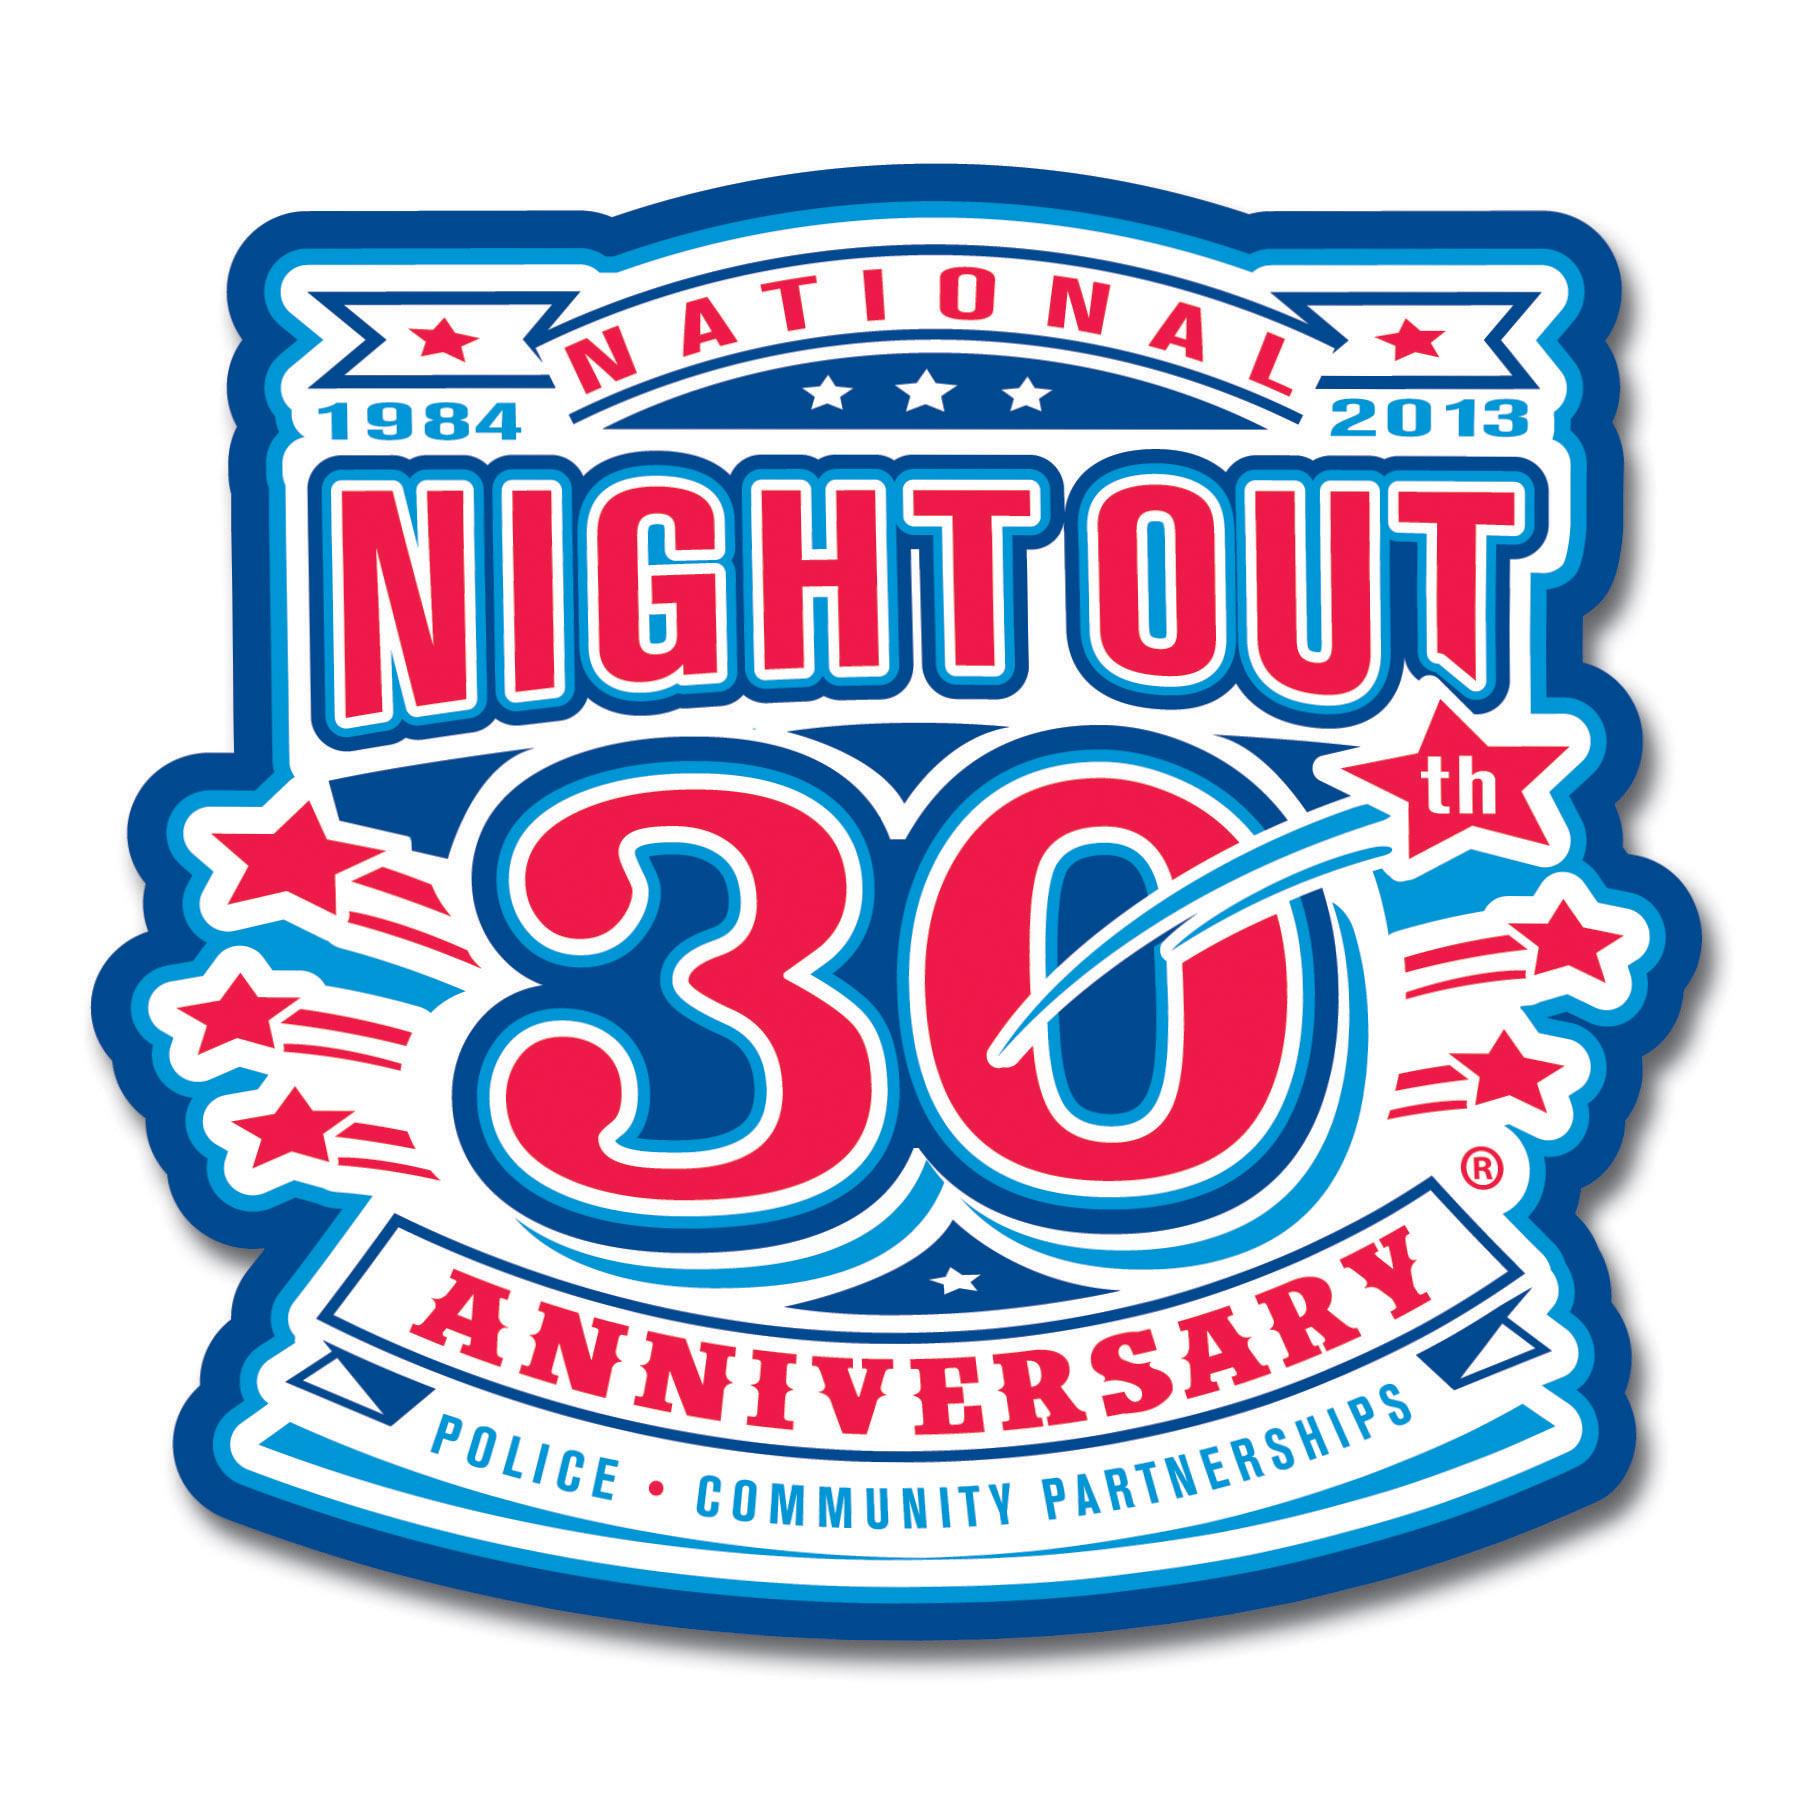 NNO Celebration Tonight! 8/6/13